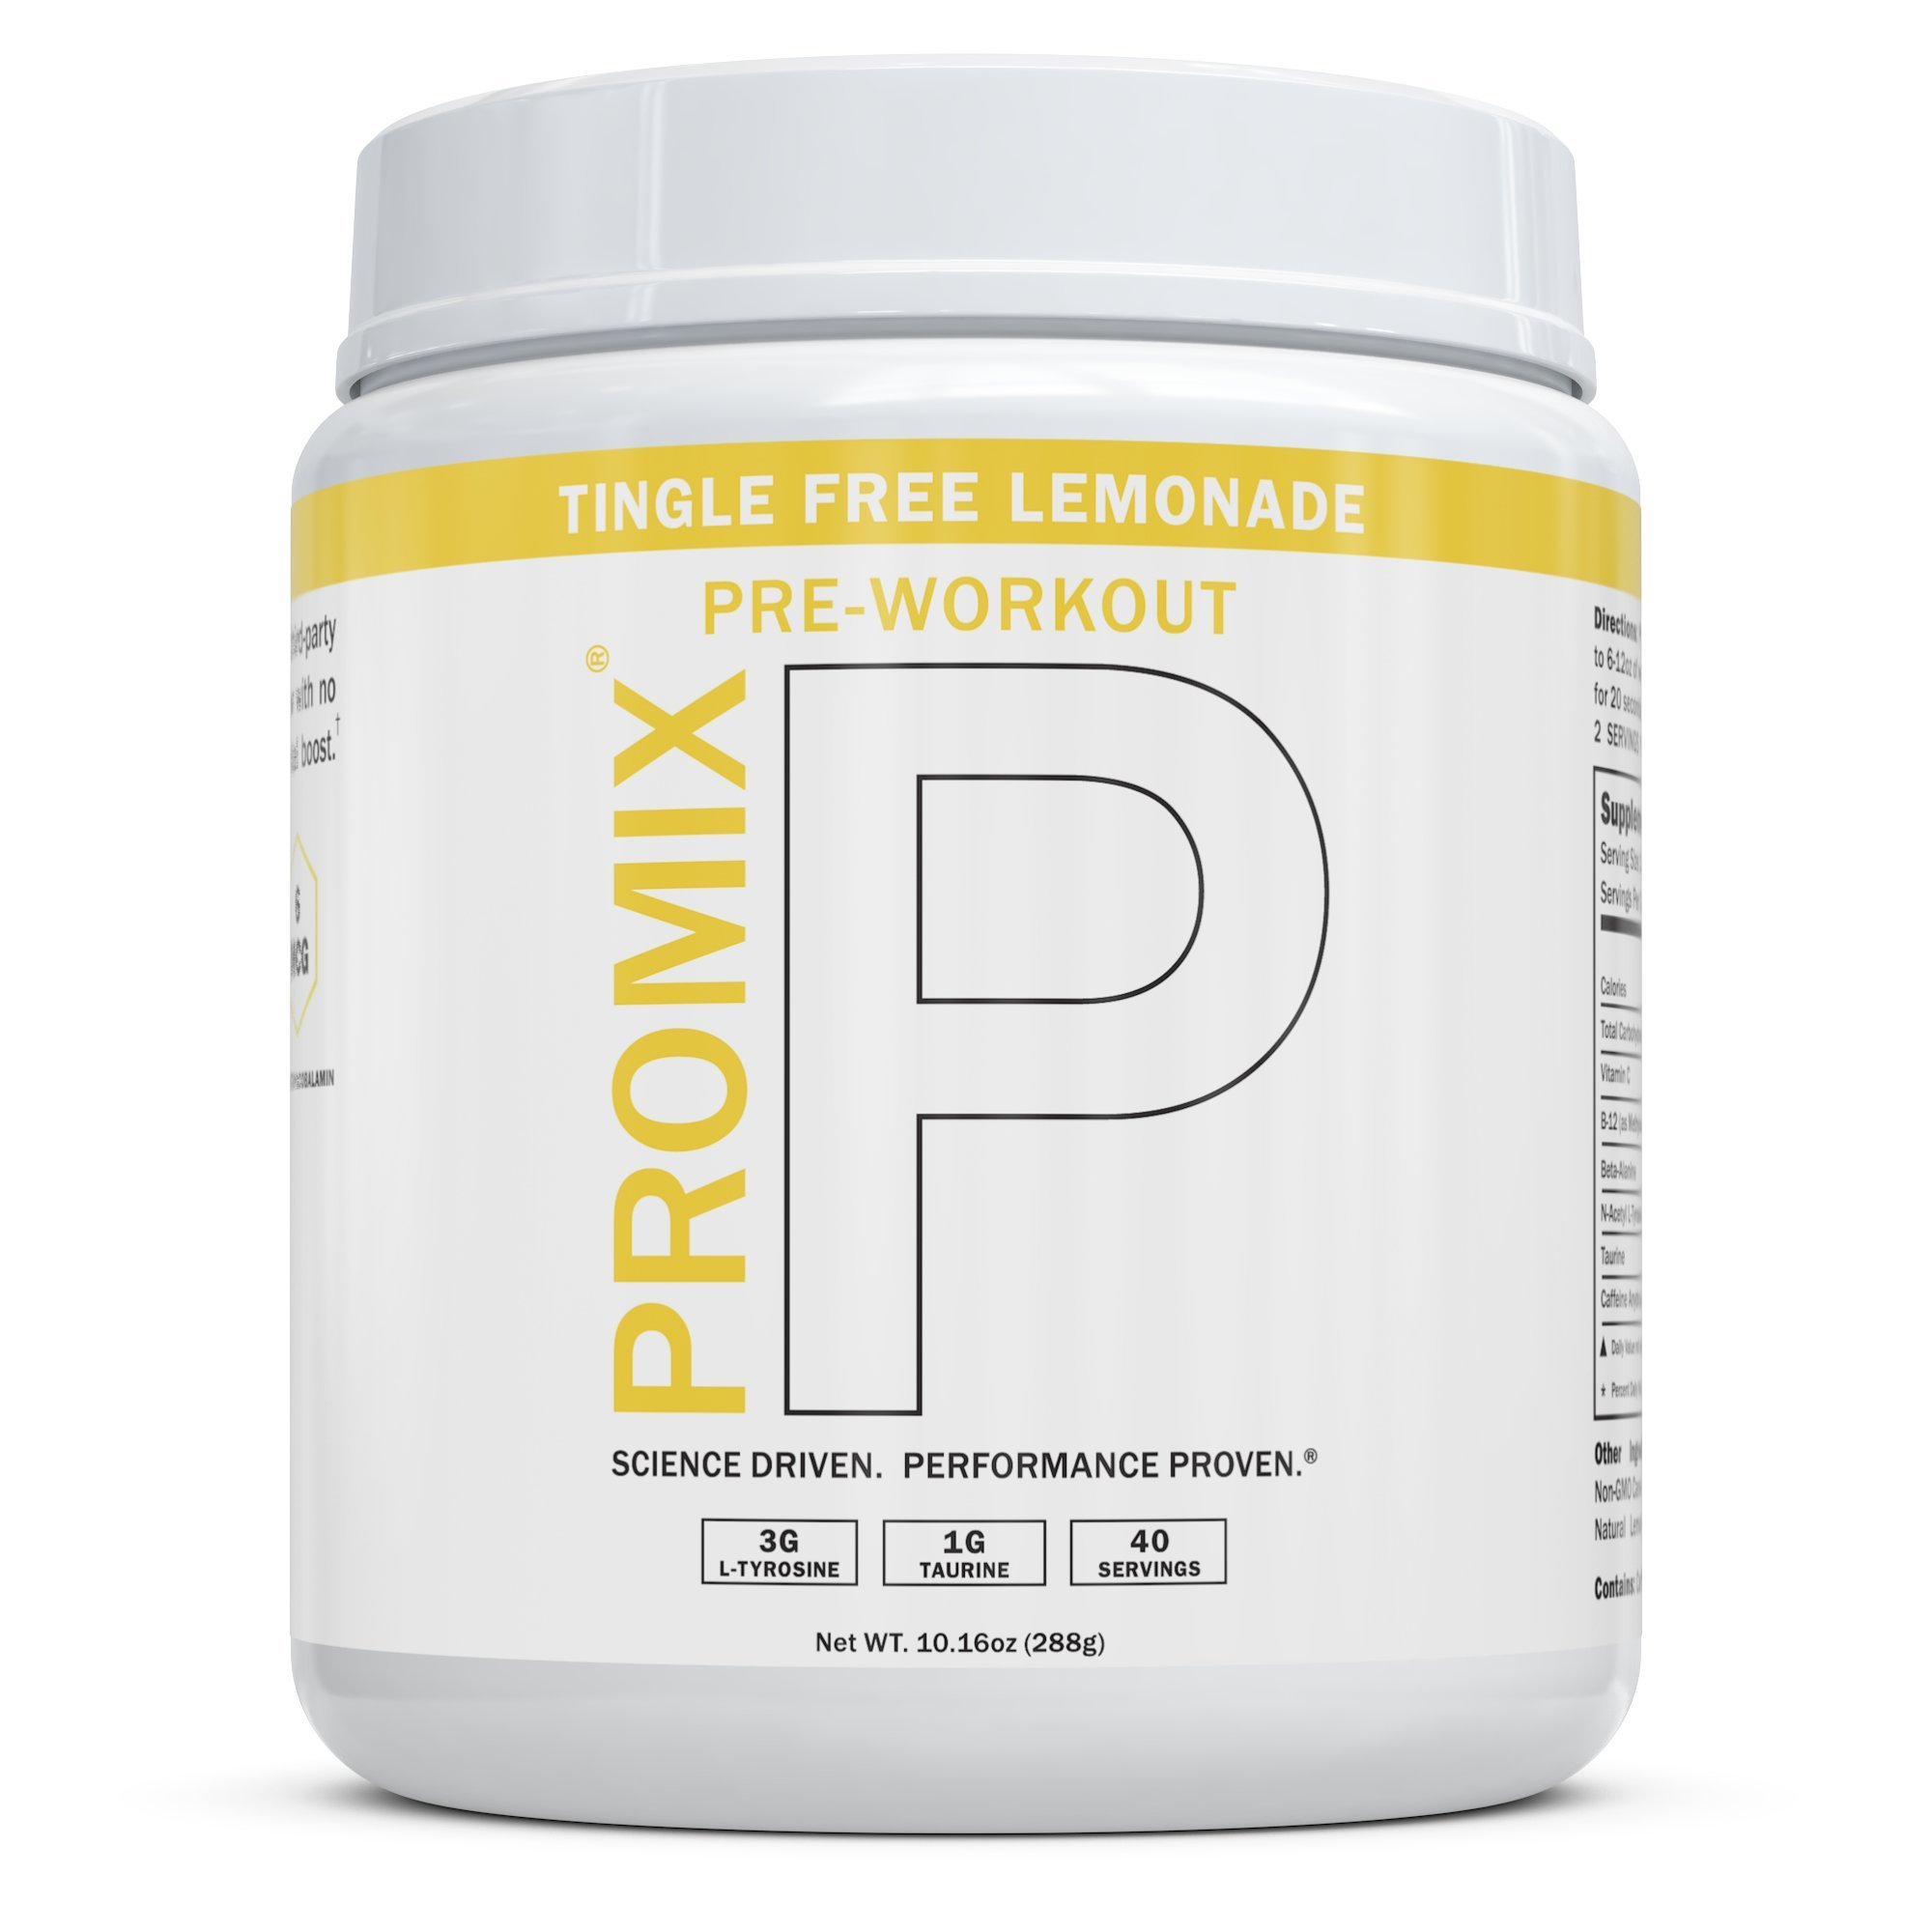 Keto Pre Workout Powder Supplement Natural Energy Focus I Paleo Performance PROMIX Women Men I Taurine Tyrosine Vitamin B12 Weight Fat Loss Blast Drink, No Preservatives, 1 Carb, No Tingle, Lemonade